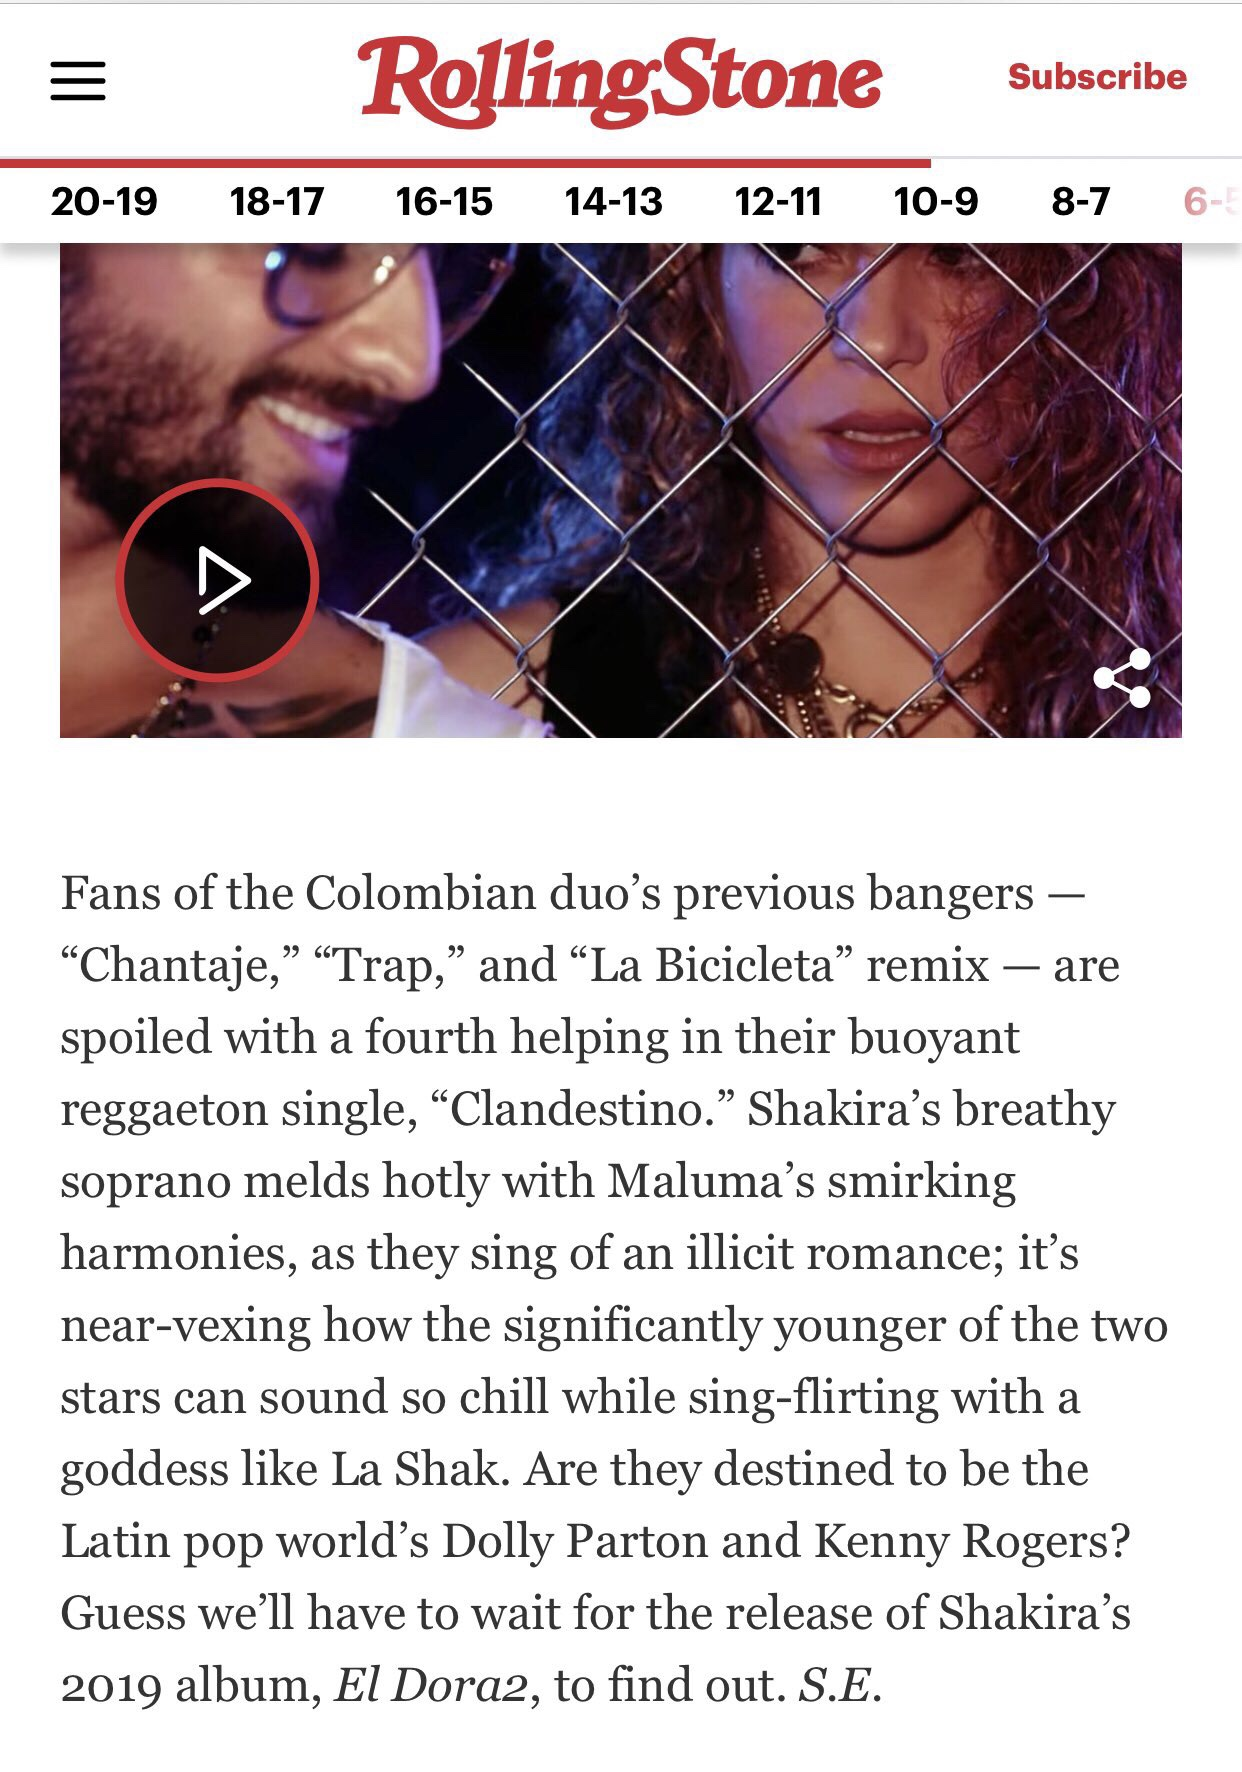 Shakira >> preparando nuevo álbum Dd62fd70bb65cd86996b0b93fdcb6f43